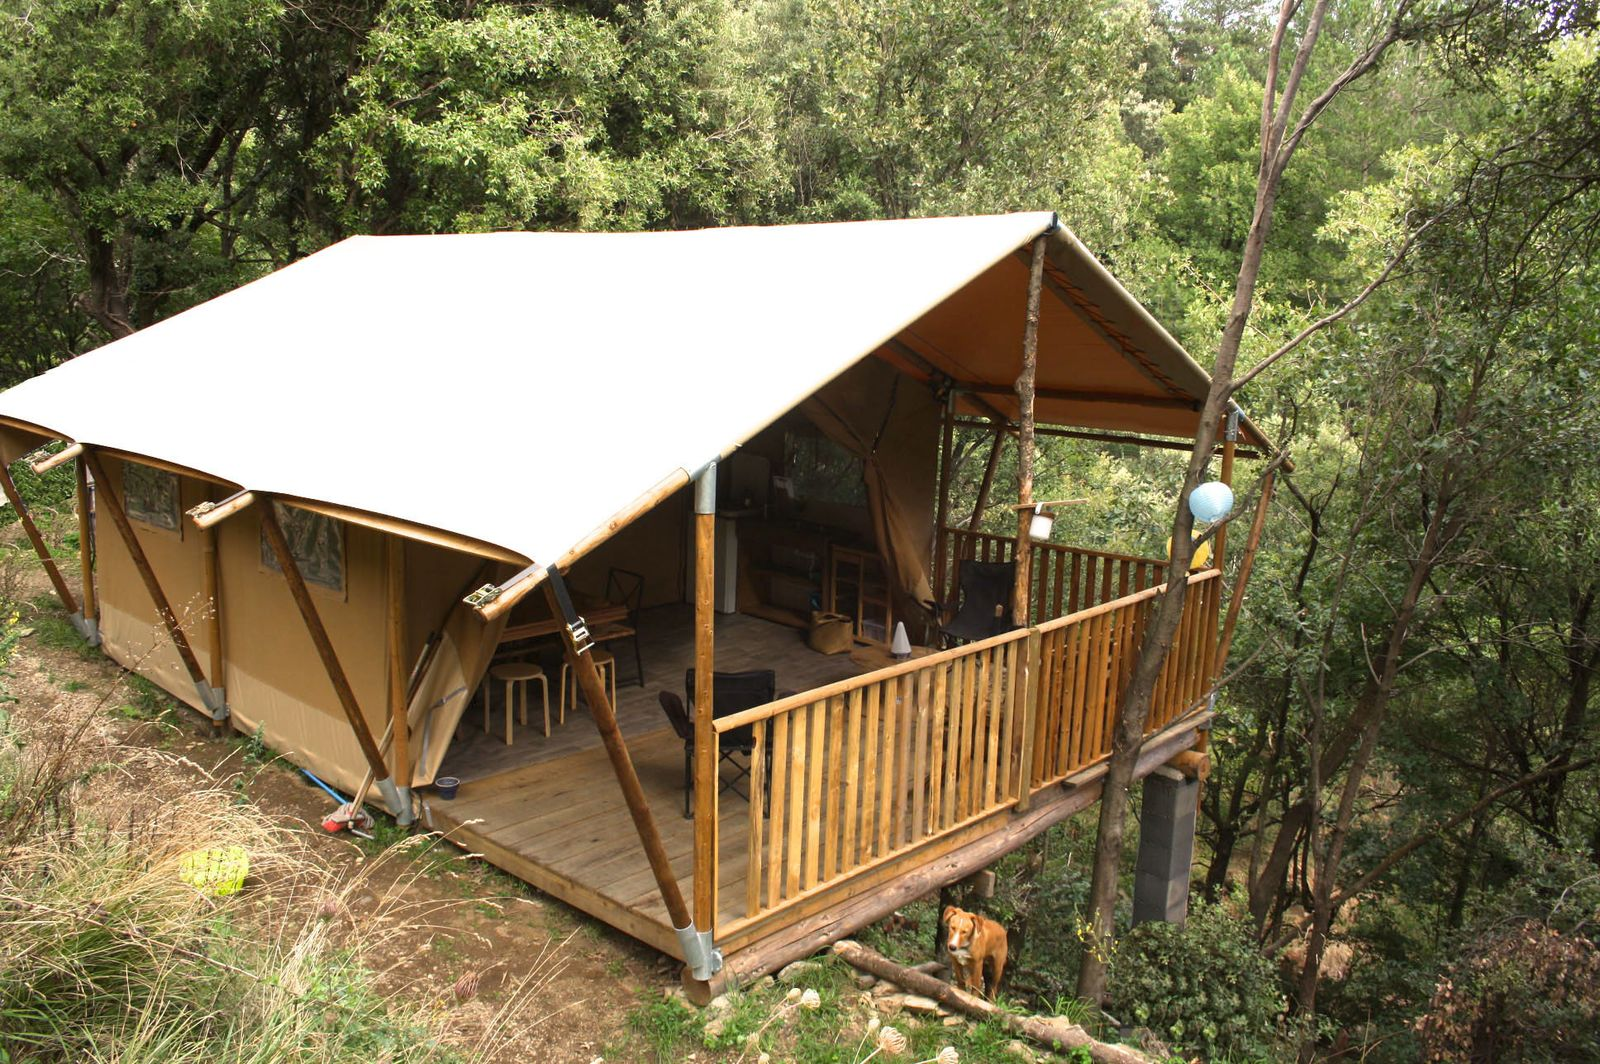 Afbeelding van Cevenolse Mas Safaritent - kampeervakantie in Franse natuur